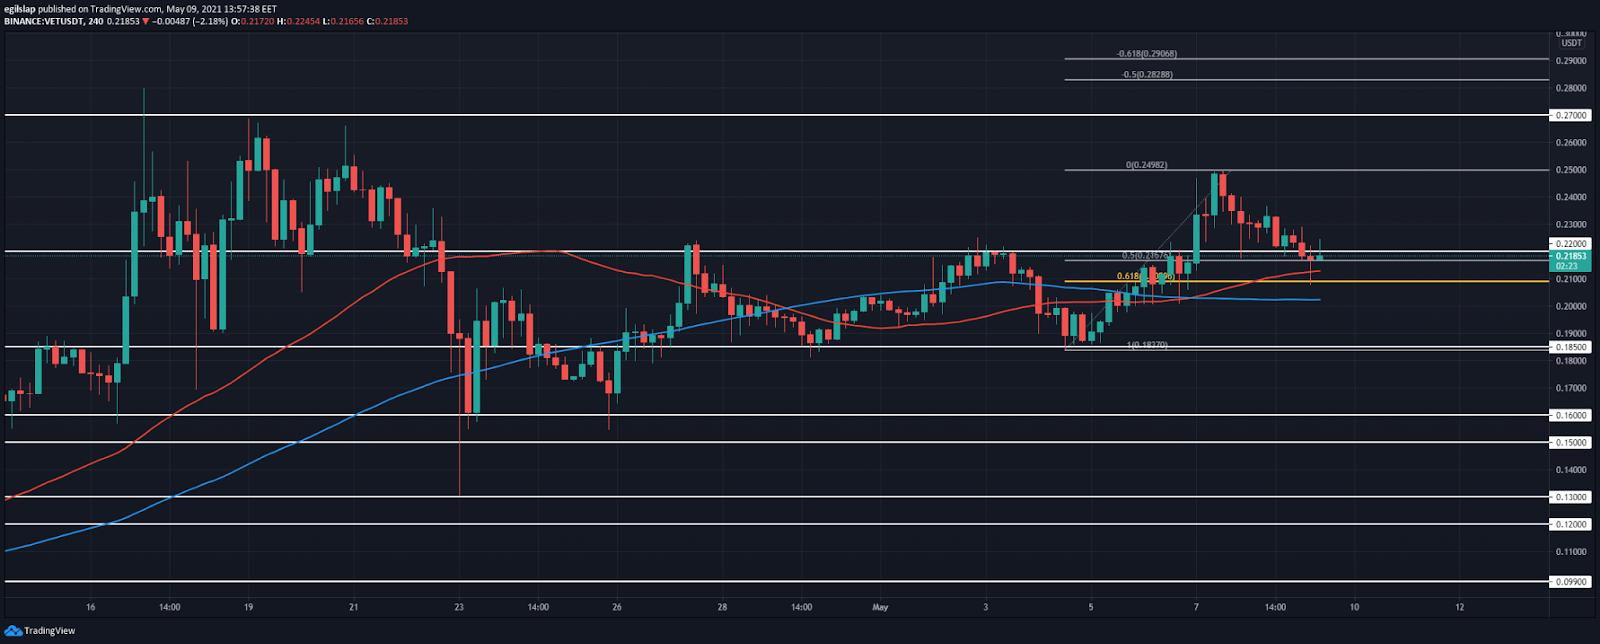 VeChain price prediction: VeChain retraces to retest $0.22, prepares to push higher? 4